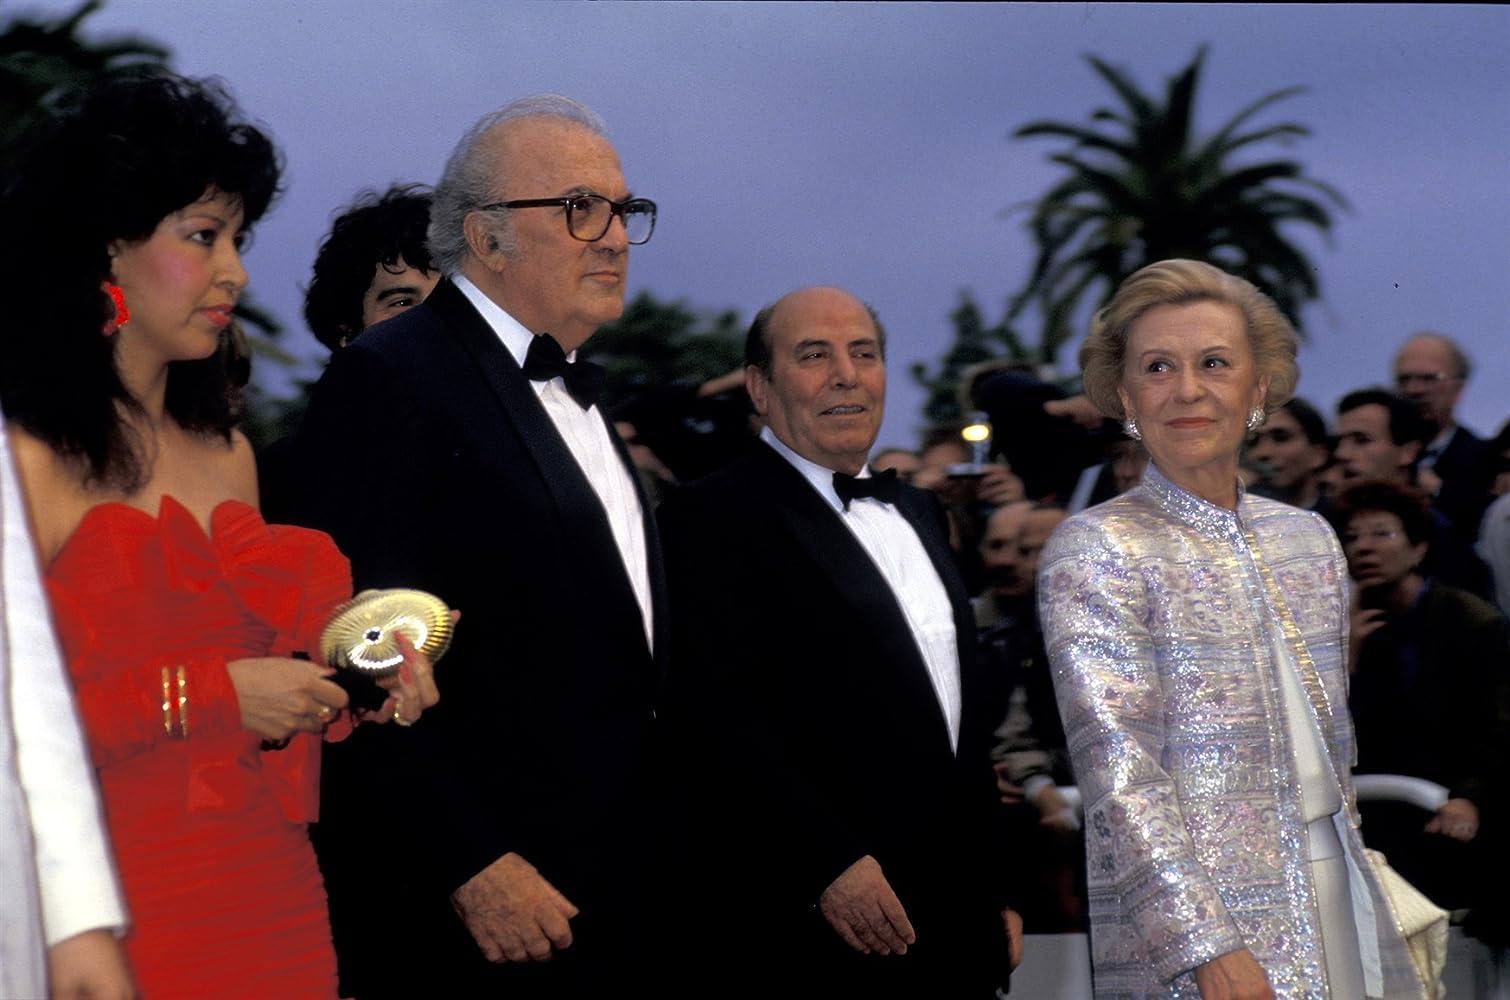 Federico Fellini, Marie-Laurence Harot, and Giulietta Masina